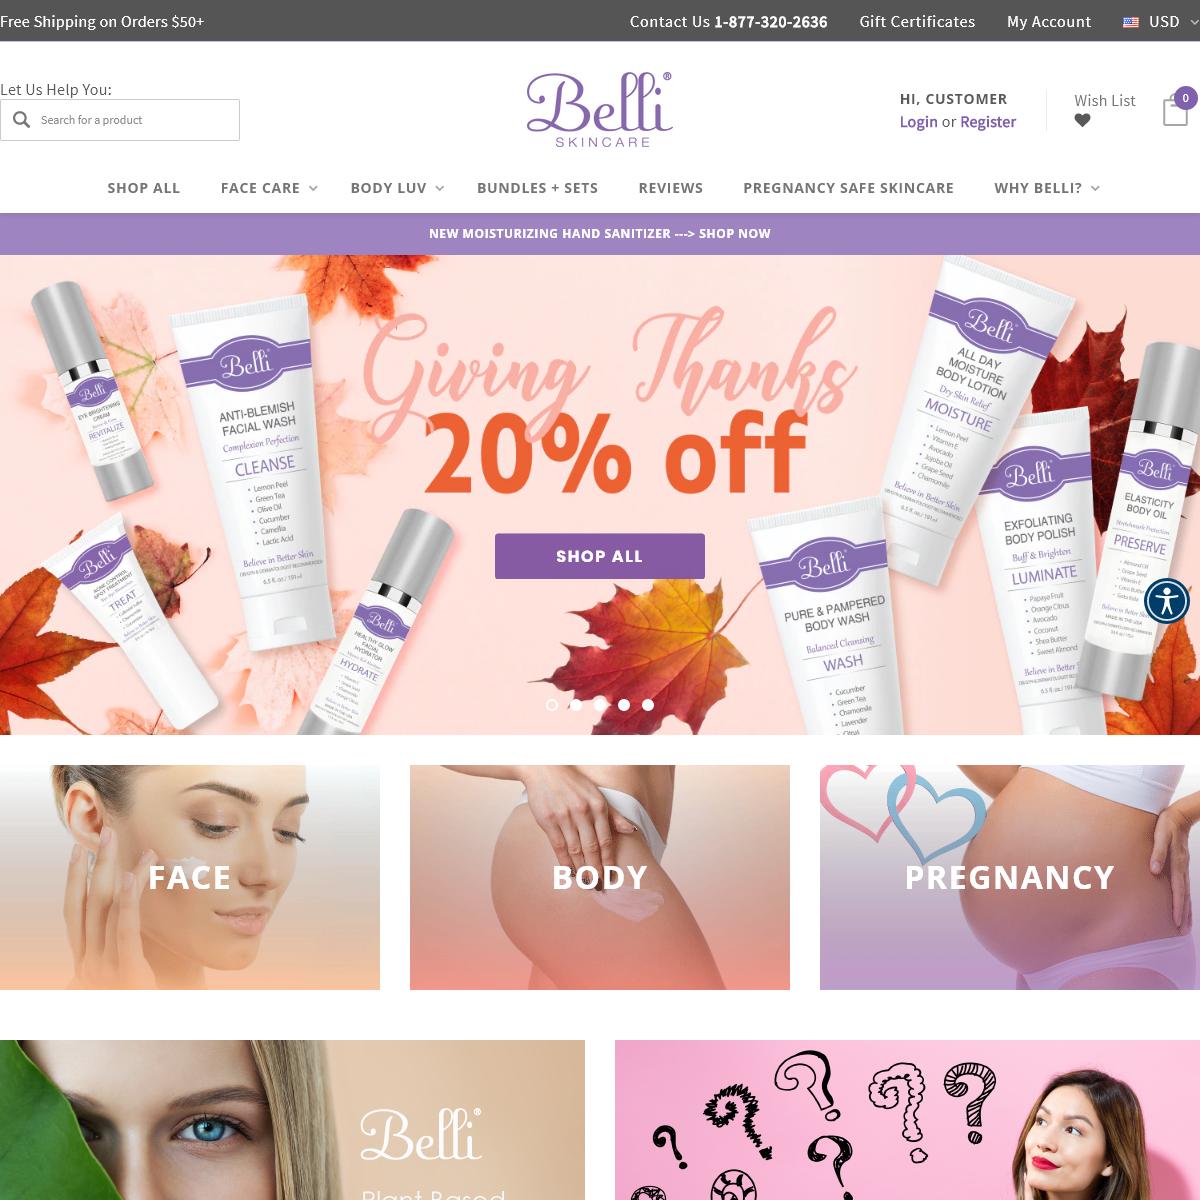 Belli Pregnancy Safe Cruelty Free Skin care - Belli Skincare